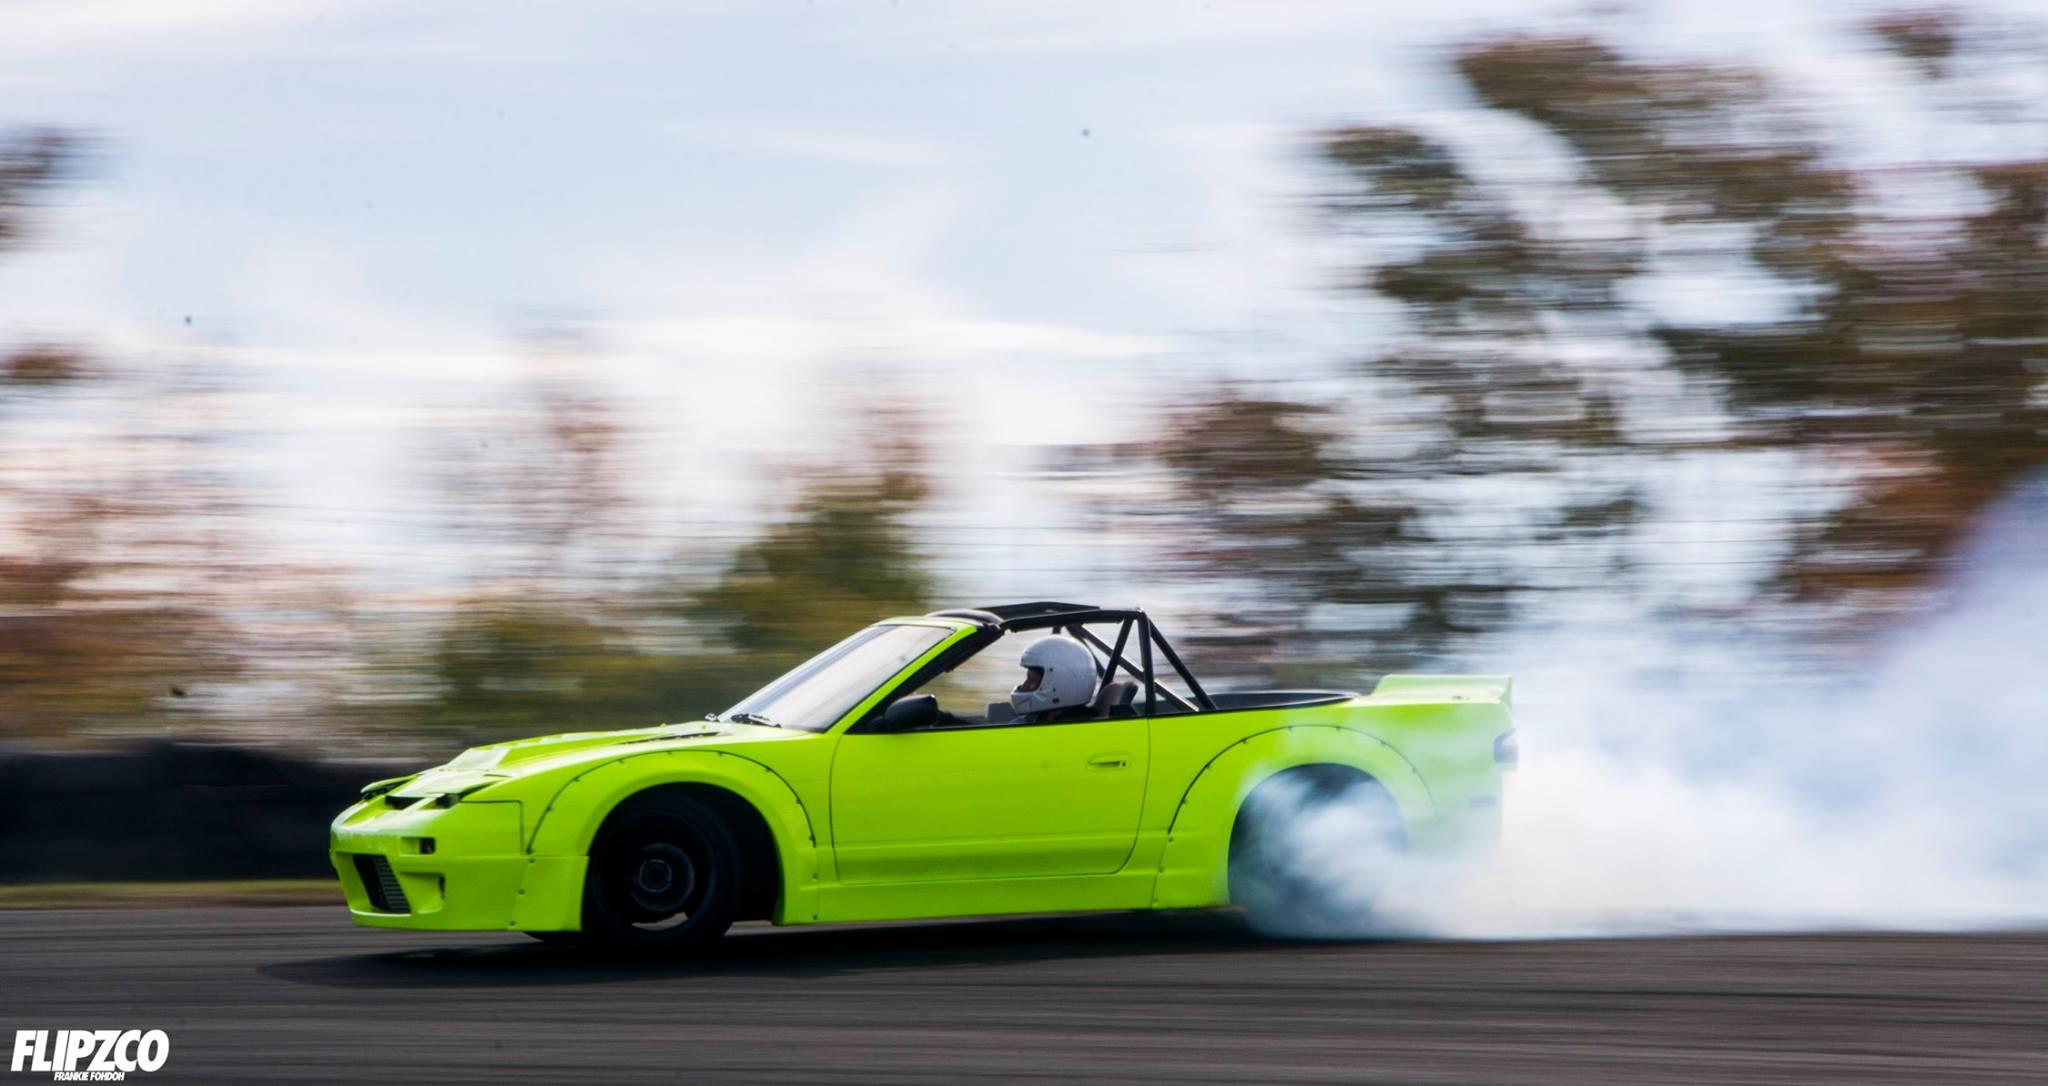 1jz S13 drifting